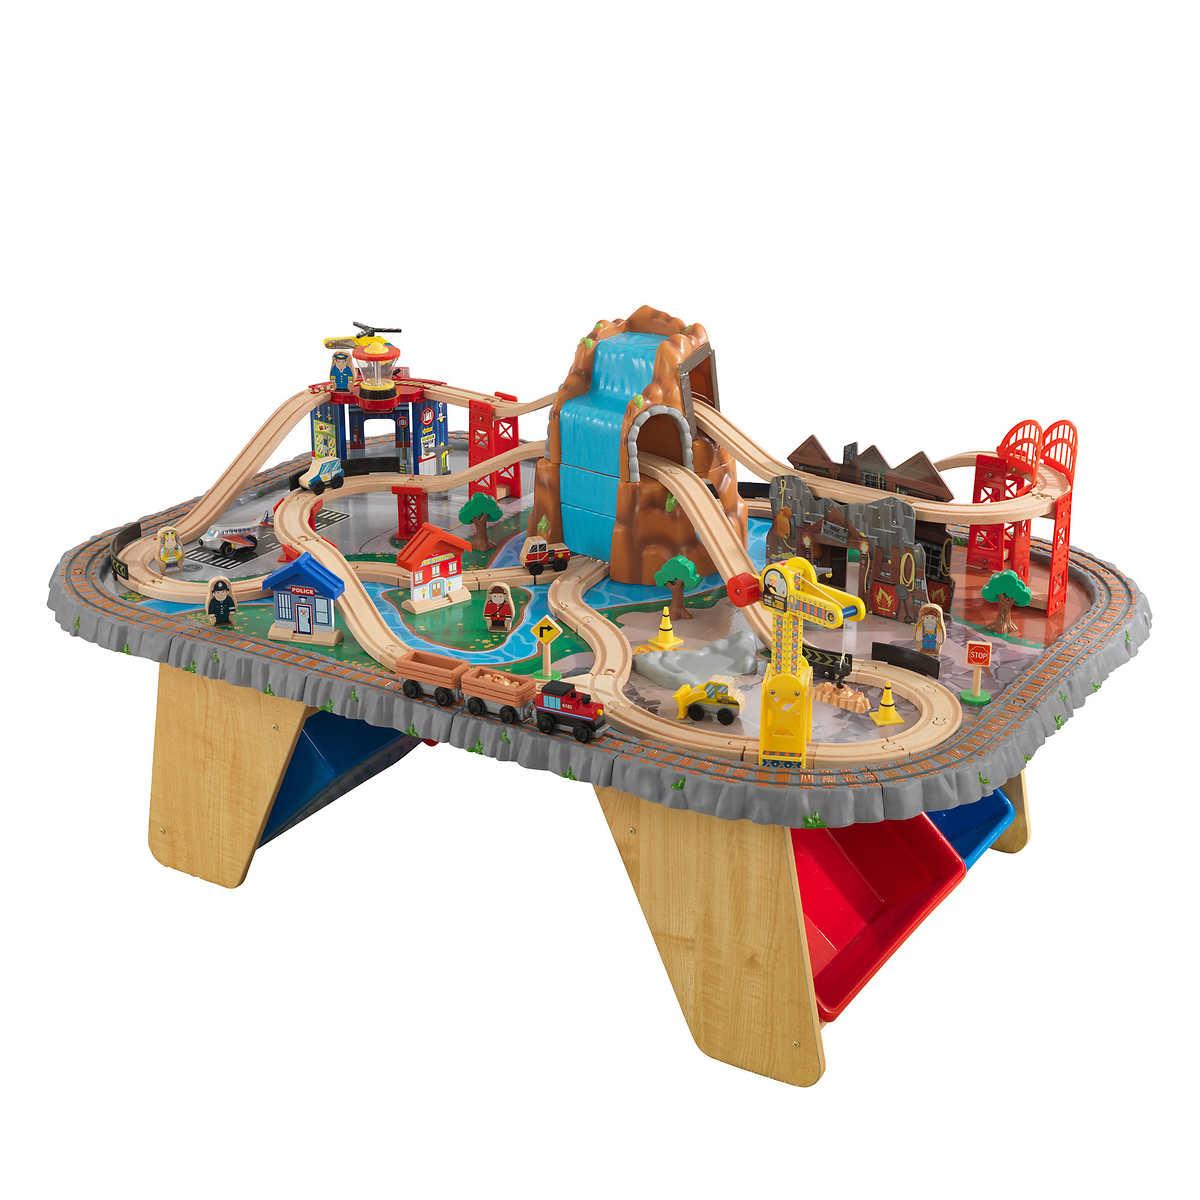 Kidkraft Metropolis Train Table And Set - Table Designs